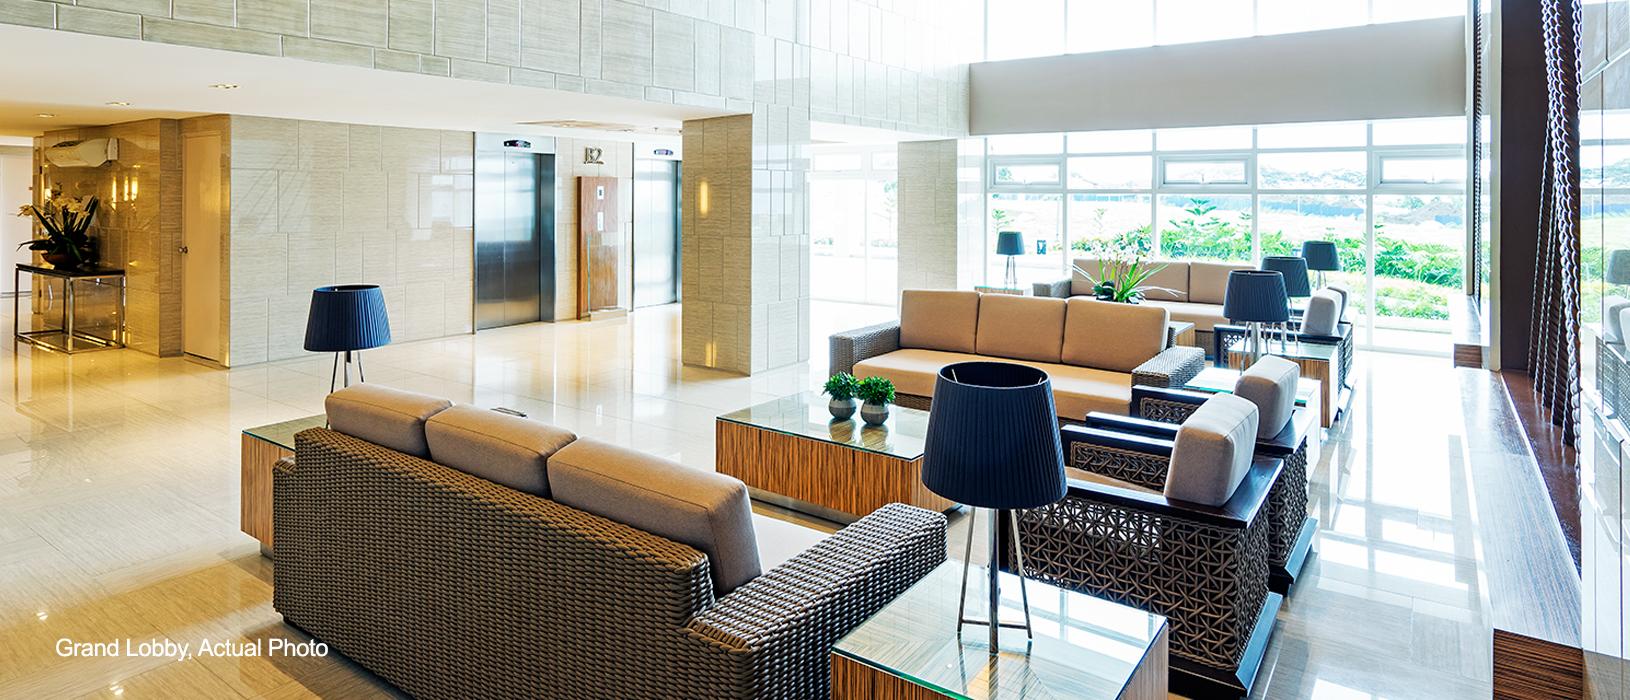 Wind Residences Grand lobby 2